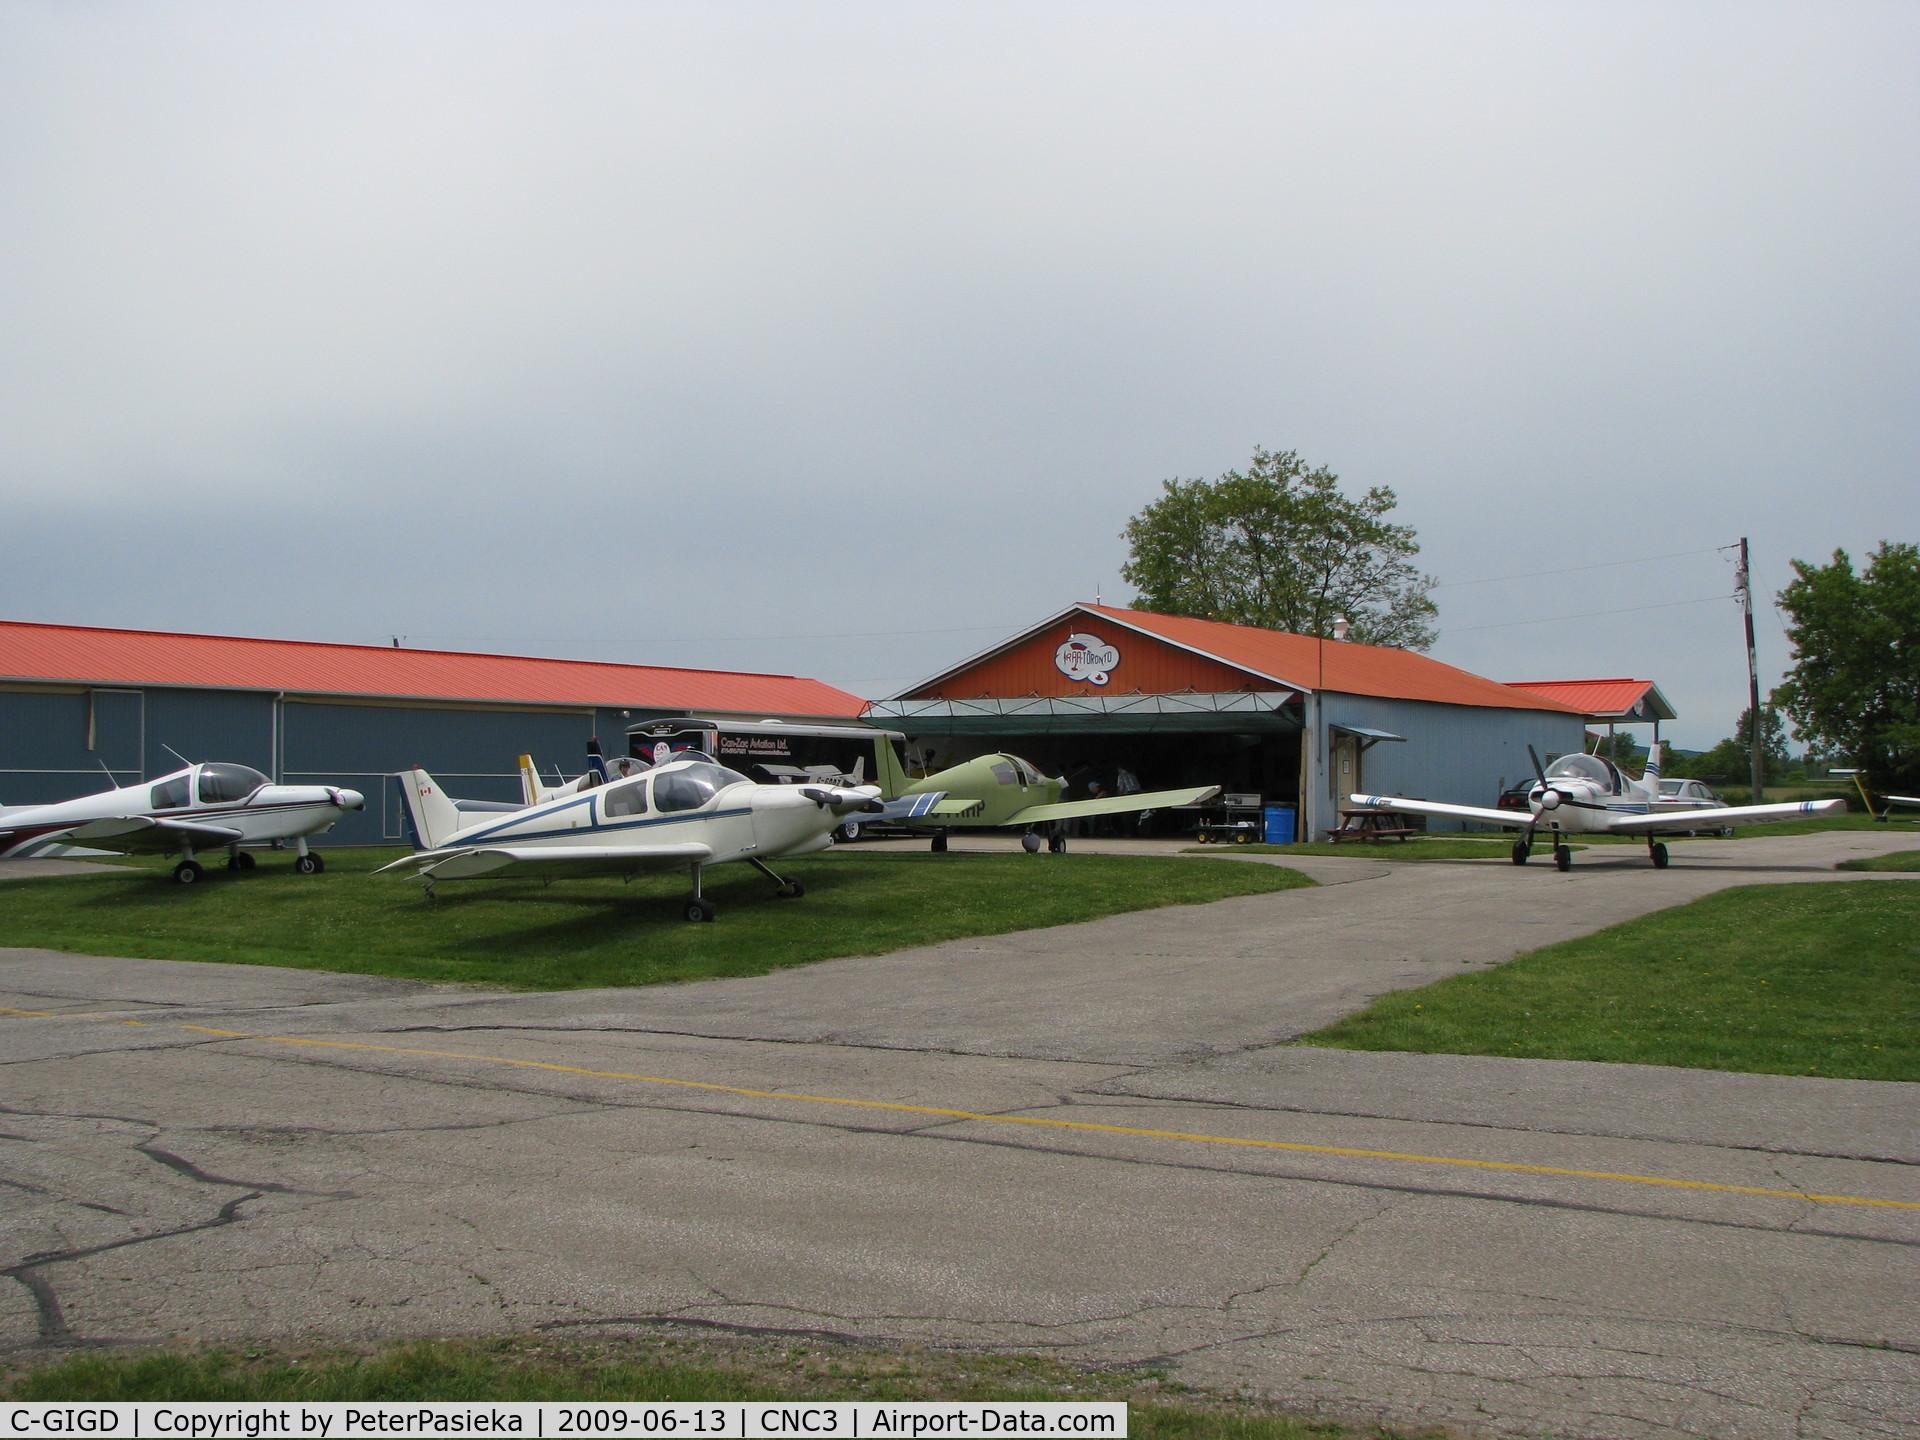 C-GIGD, 1986 Zenair CH-300 Tri-Z C/N 3-473, @ Brampton Airport